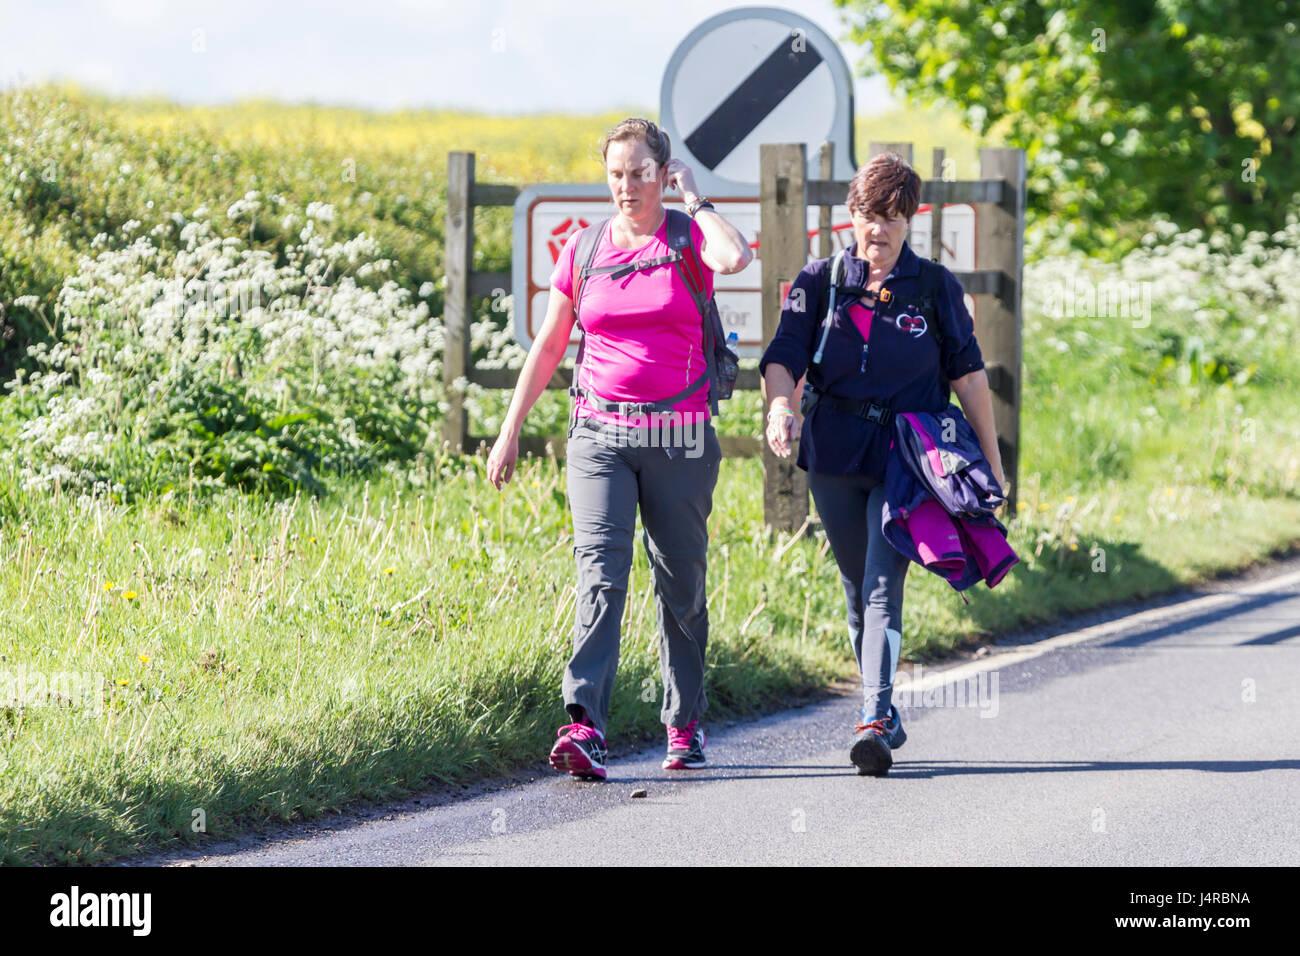 Wellingborough, Northamptonshire, U.K. 14th May 2017. The 38th International Waendel walk. Participant have travelled - Stock Image